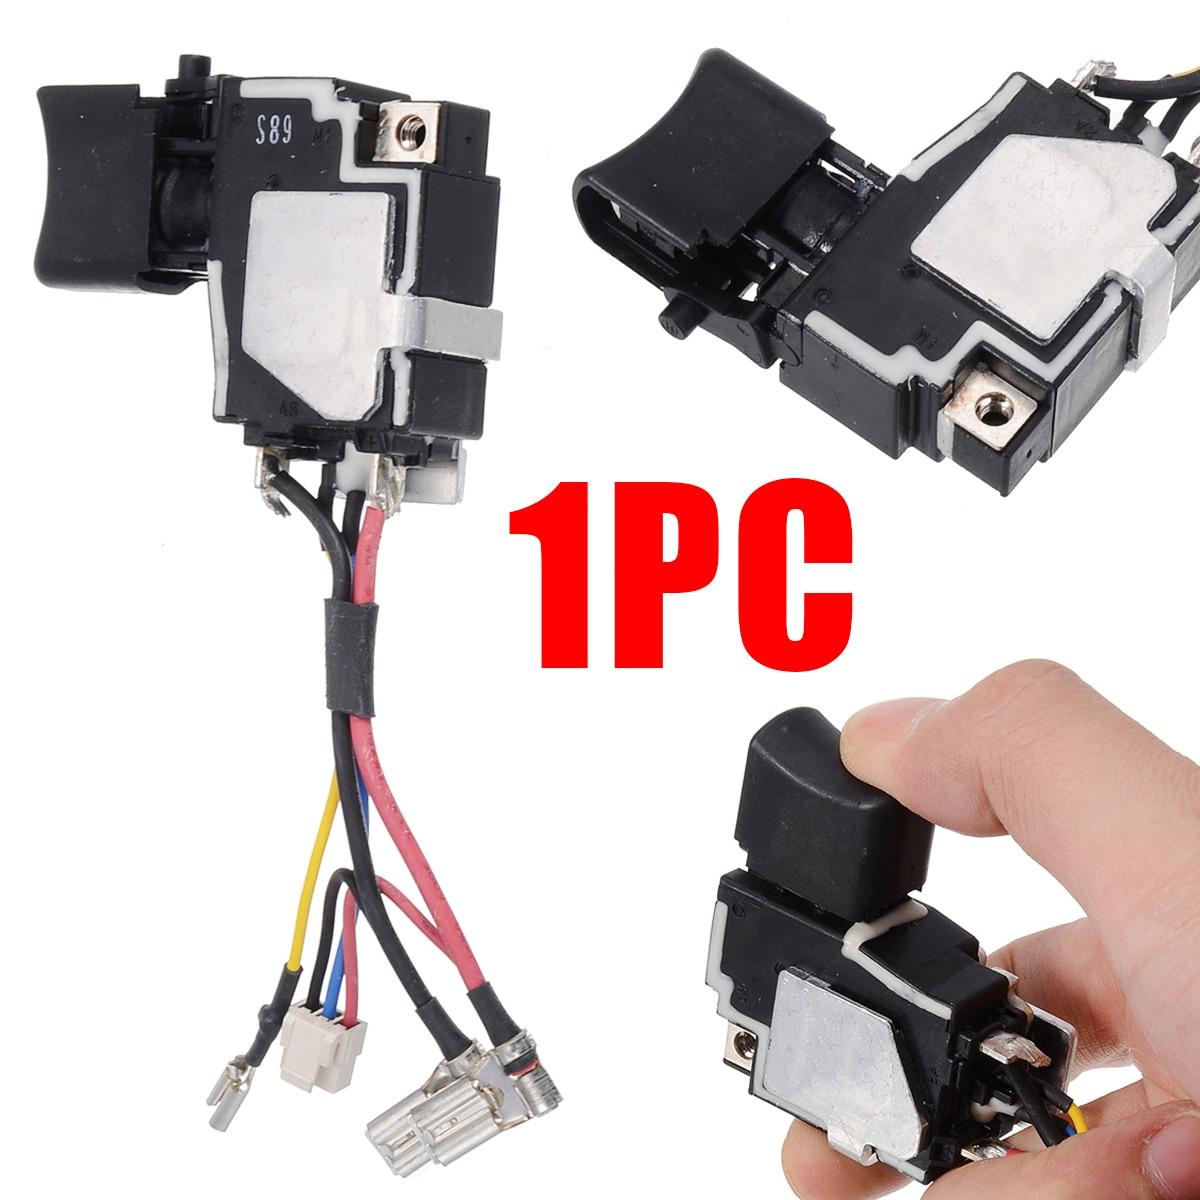 1Pcs New 18V Switch For 6507228 DTD134 BTD134 BTD146 DTD146 BTD134Z TD134D For Power Tools Accessories